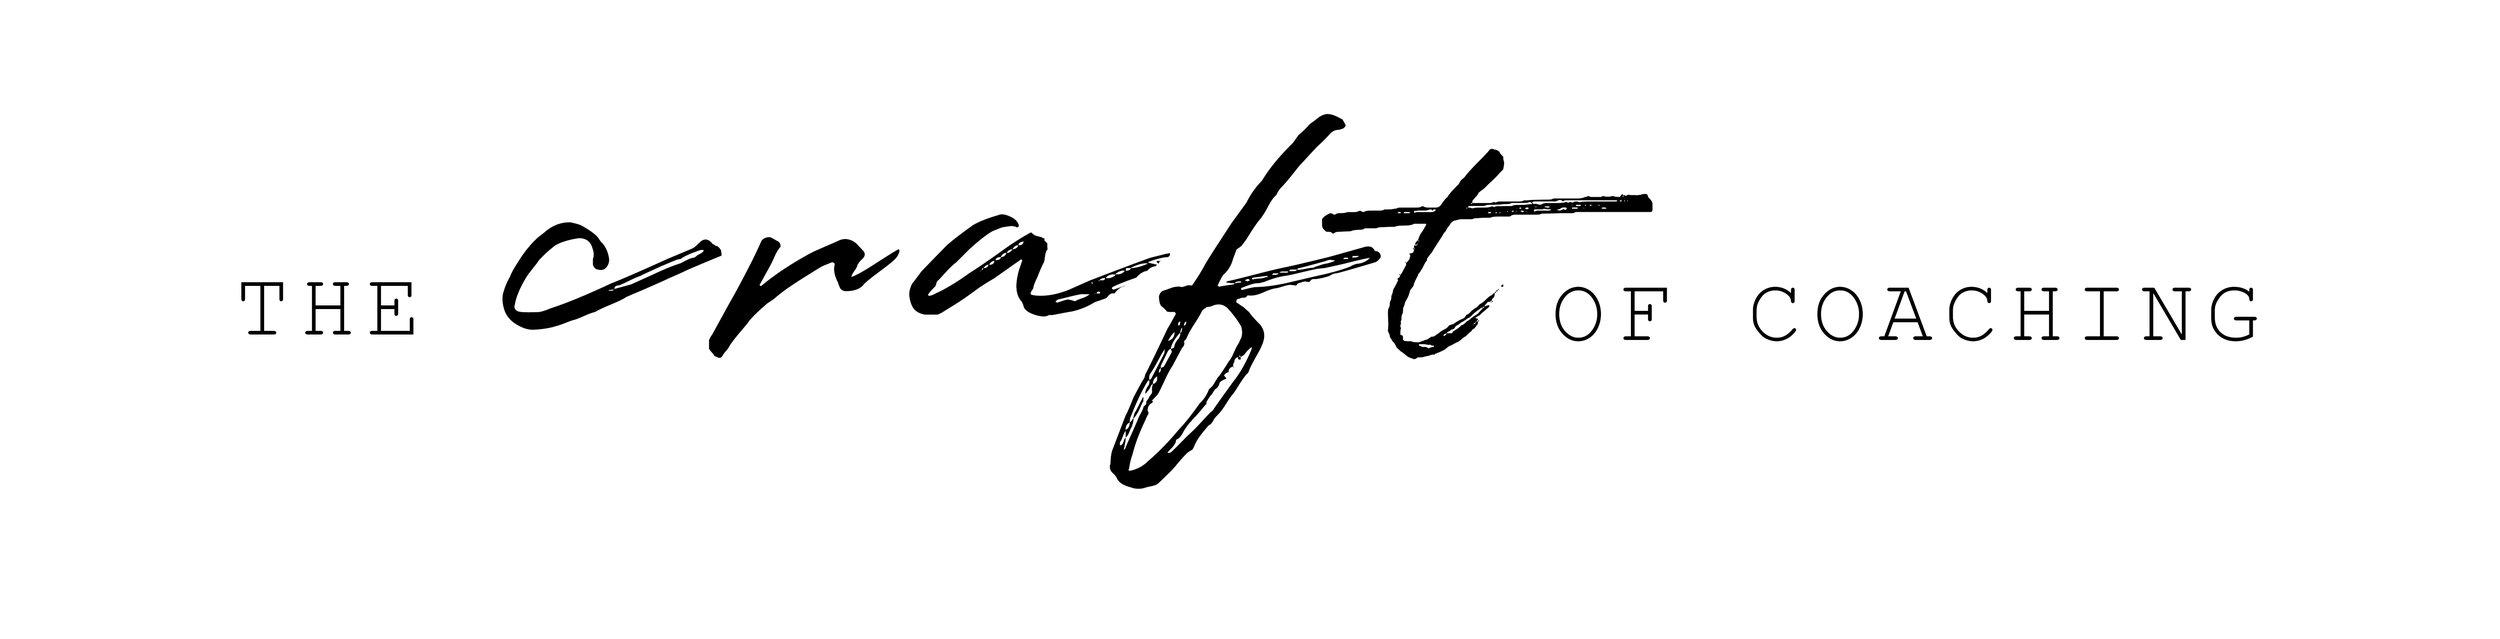 PSA.logo.jpg